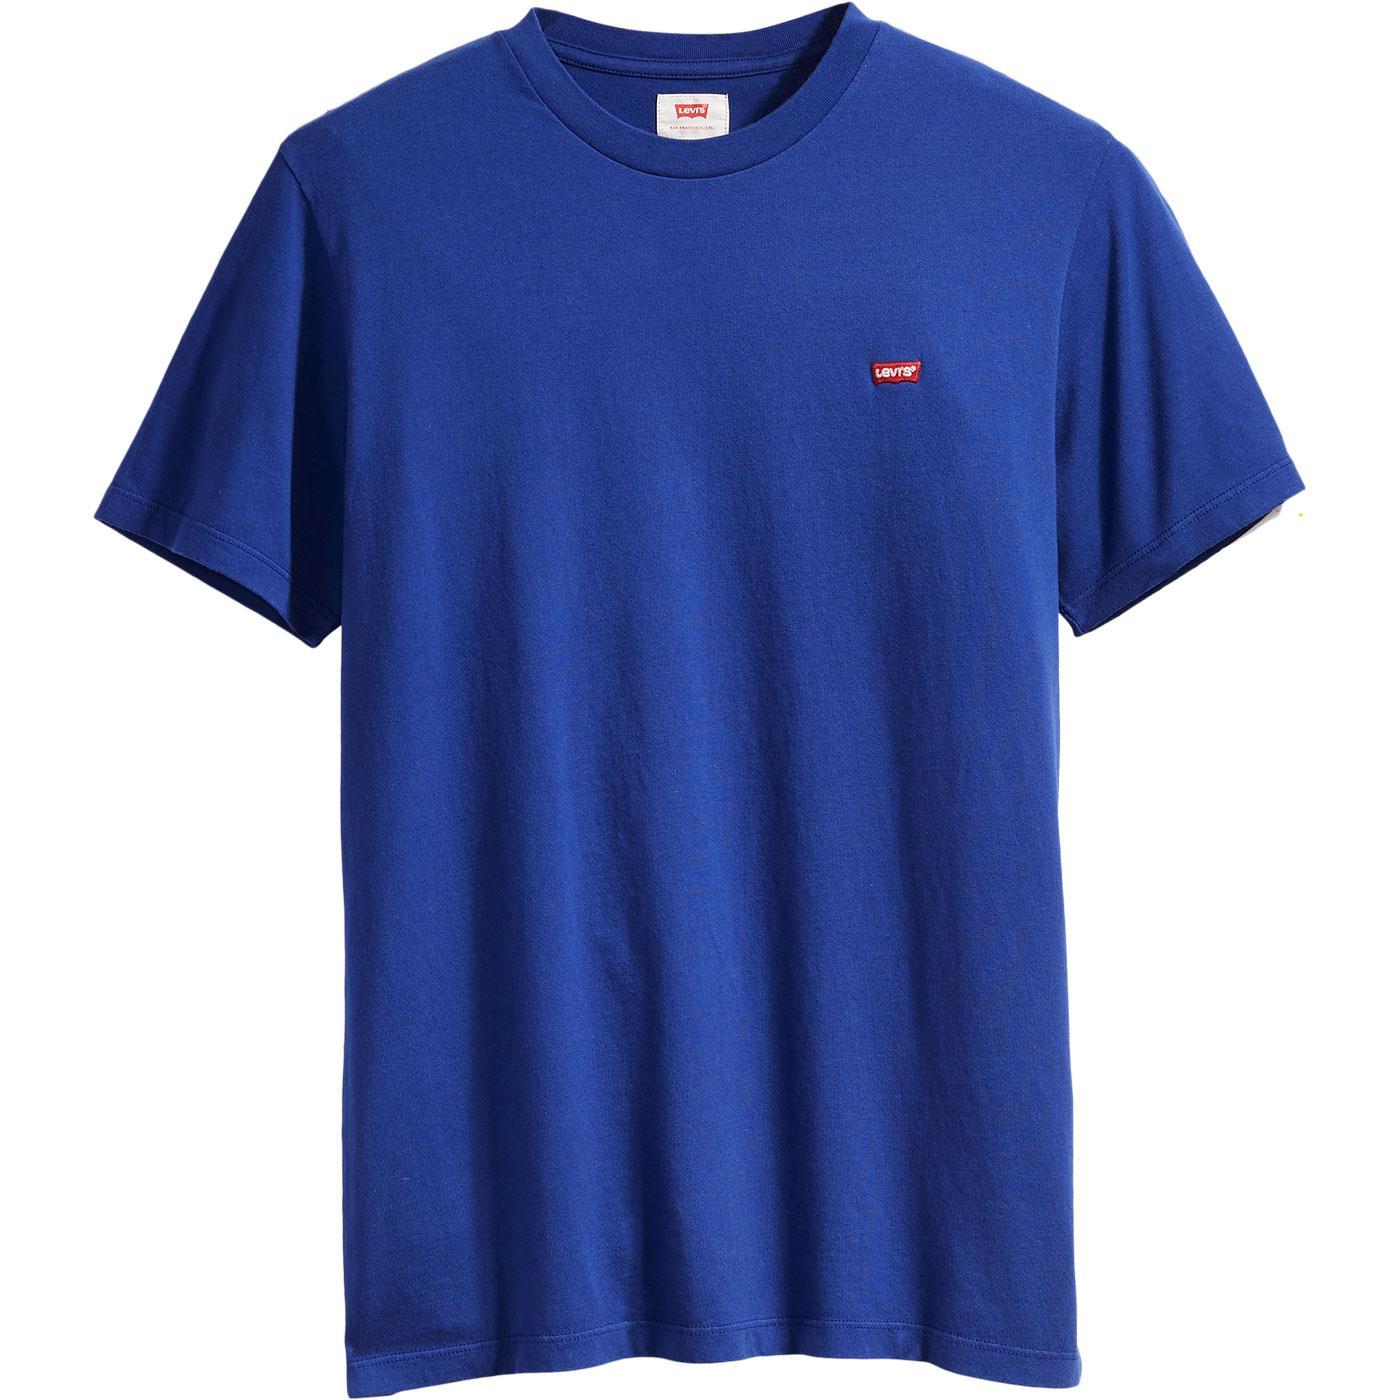 LEVI'S Original HM Small Logo Tee (Sodalite Blue)